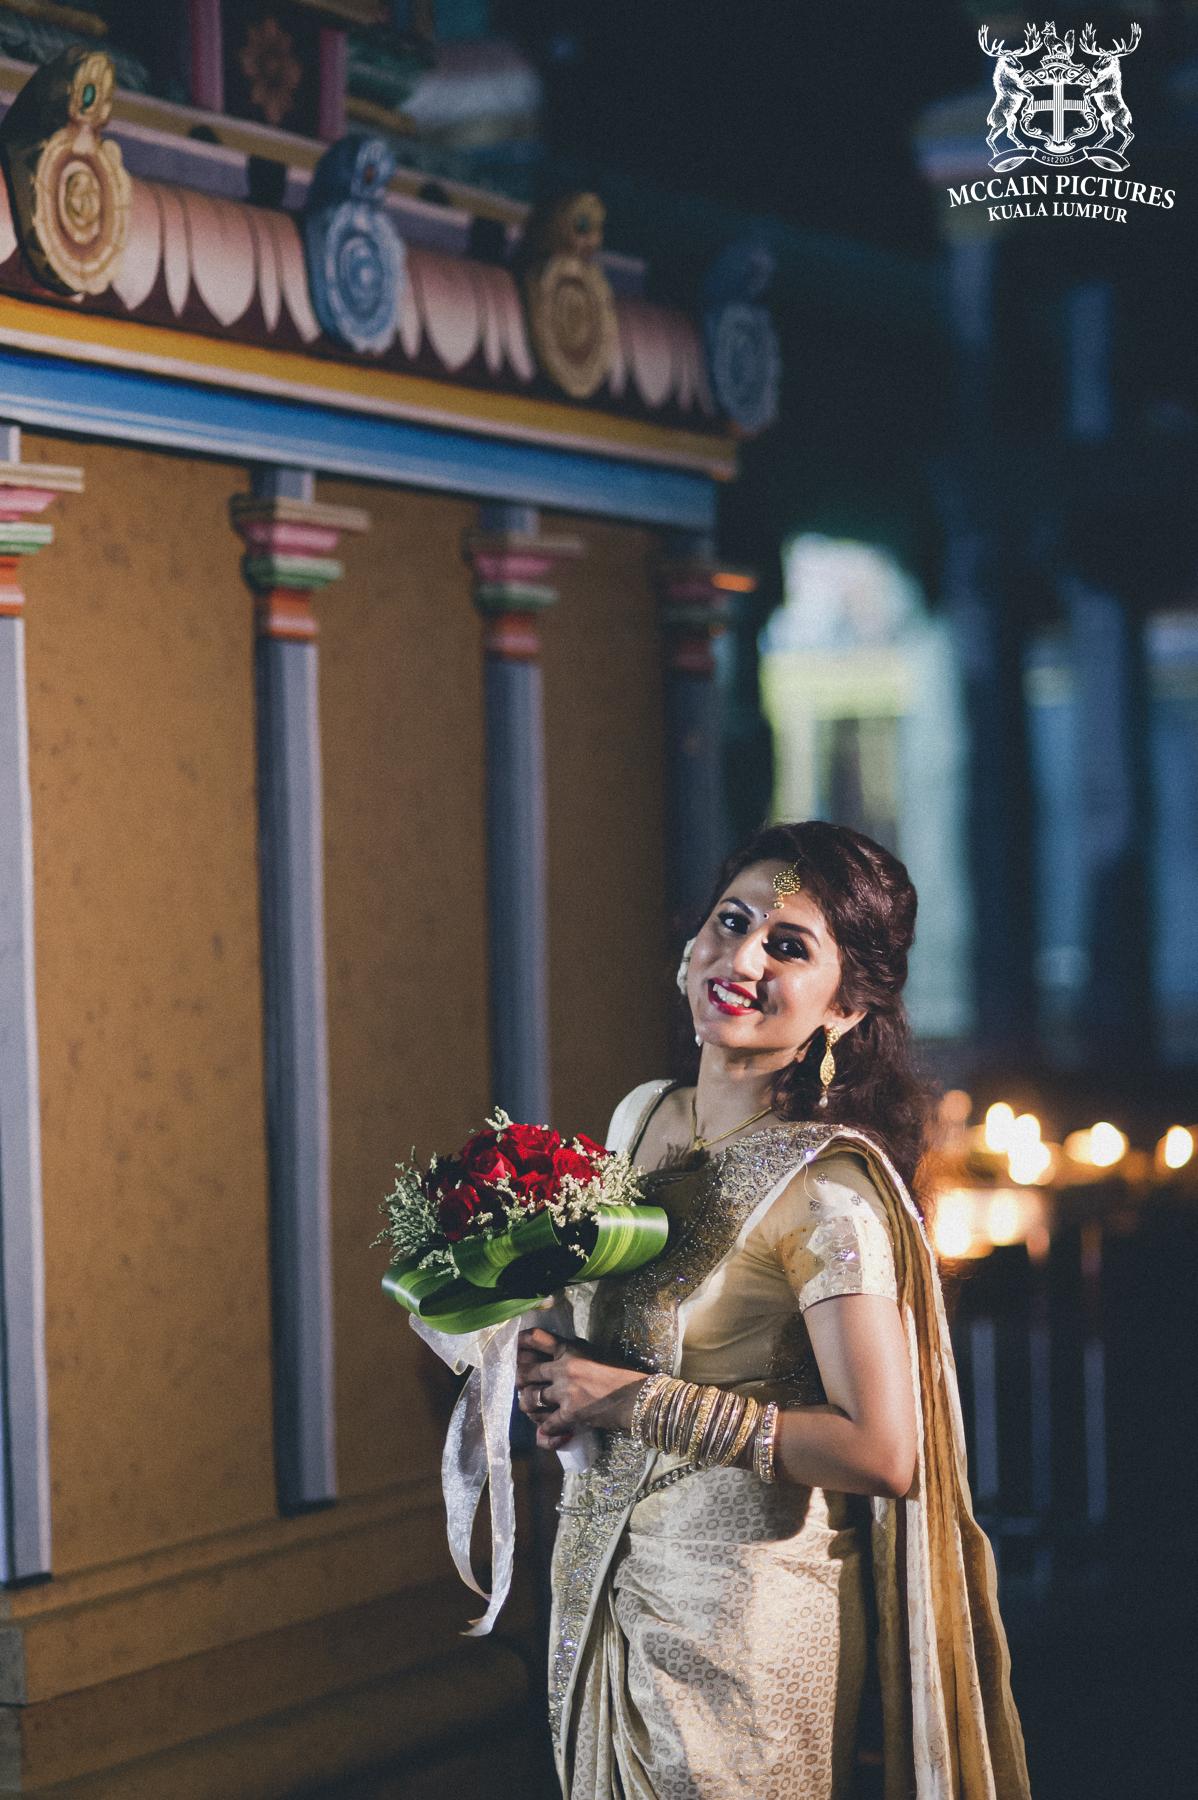 mccain goh mccain pictures wedding photographer malaysia-369